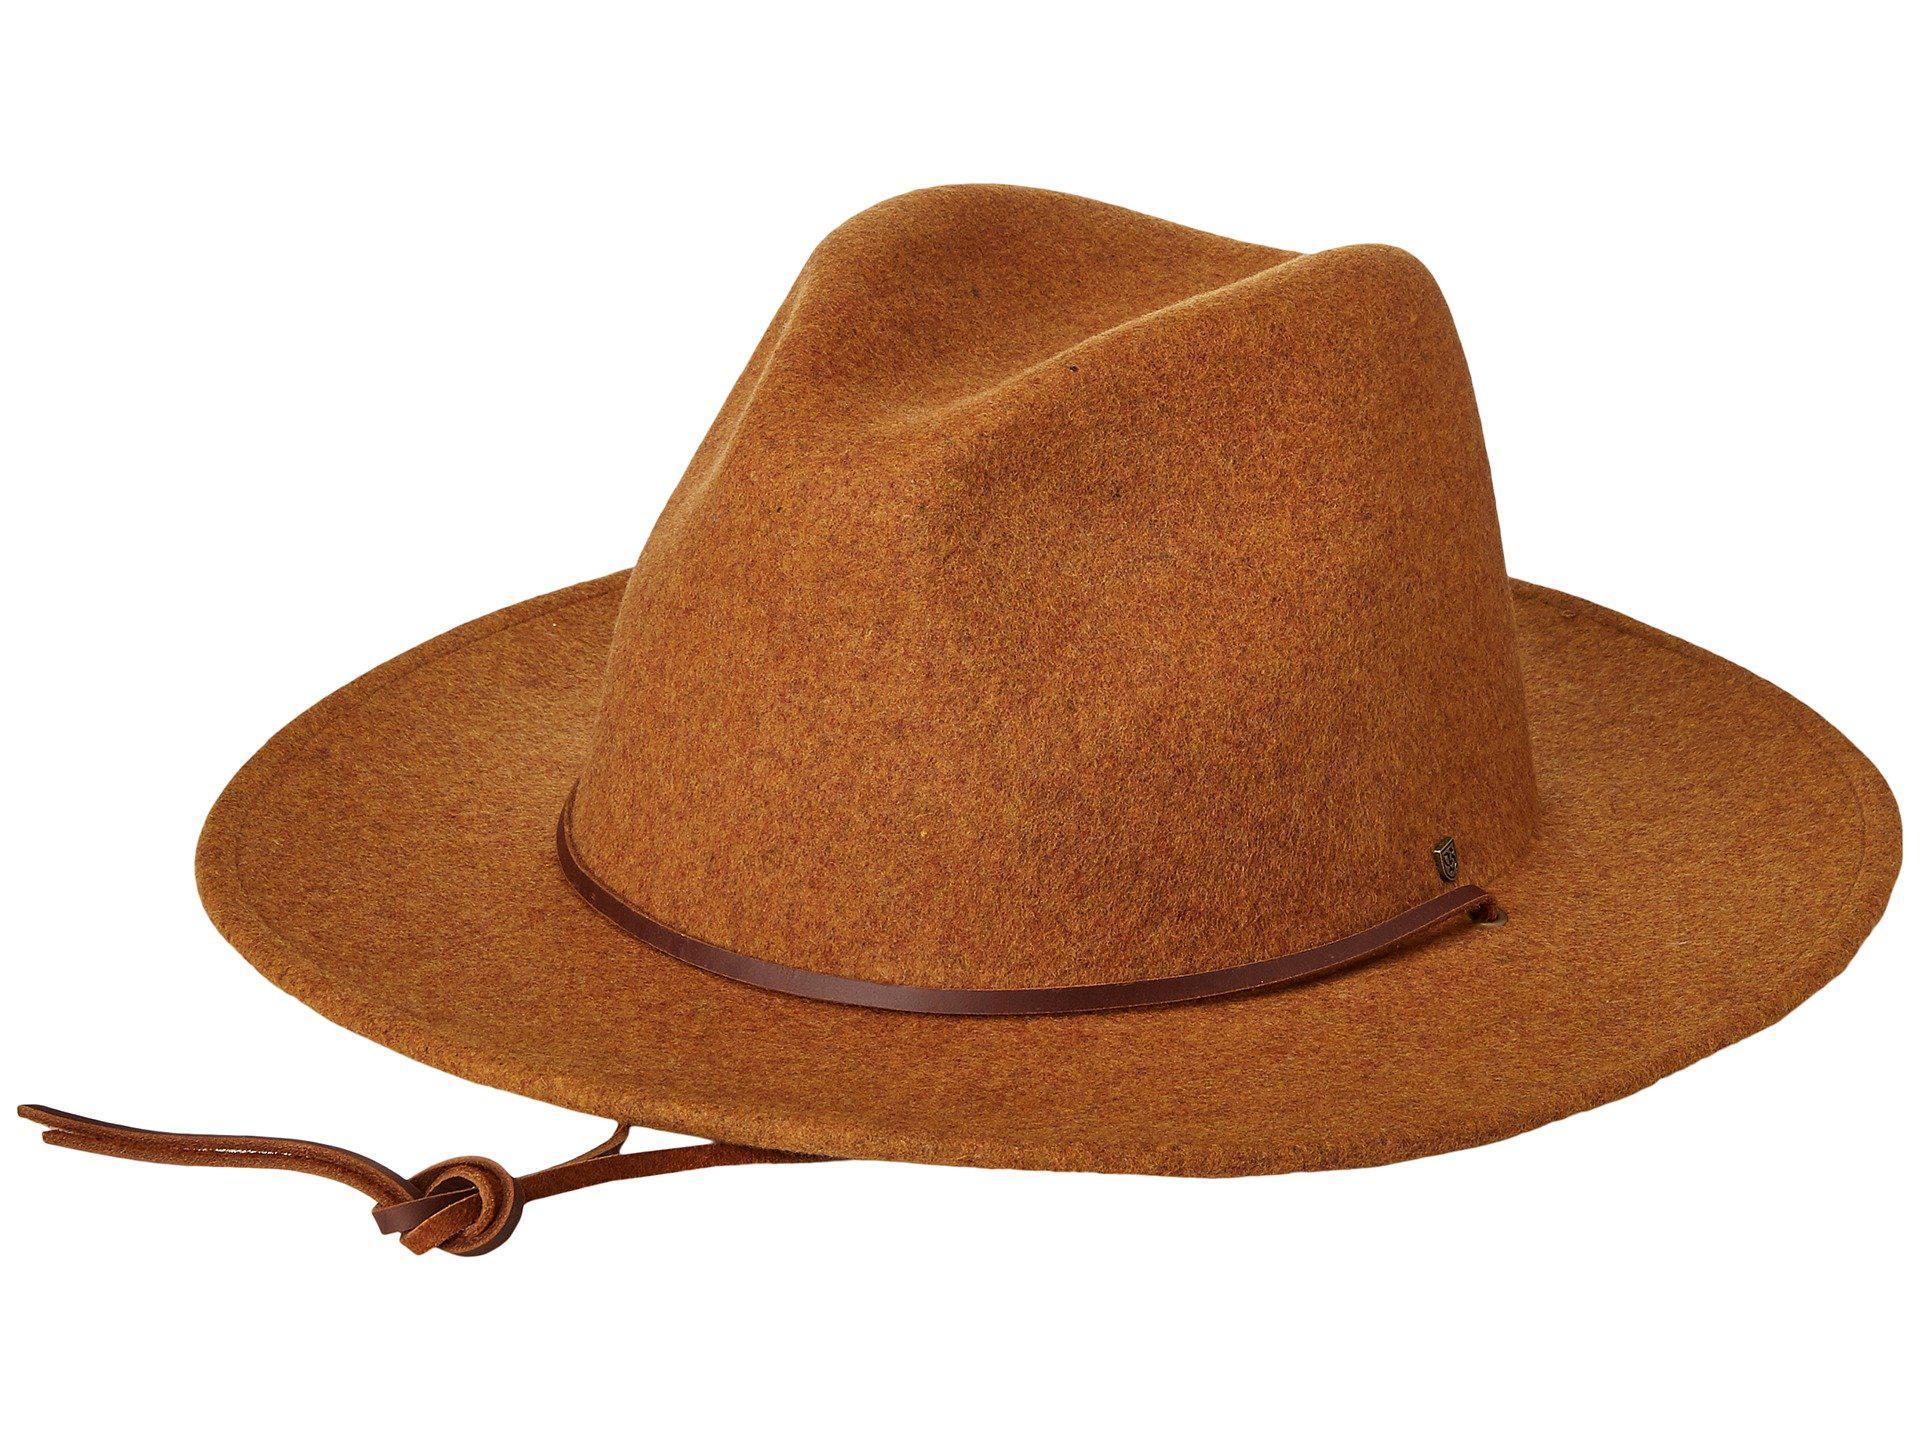 Lyst - Brixton Field Hat in Brown 71d47c95ba4